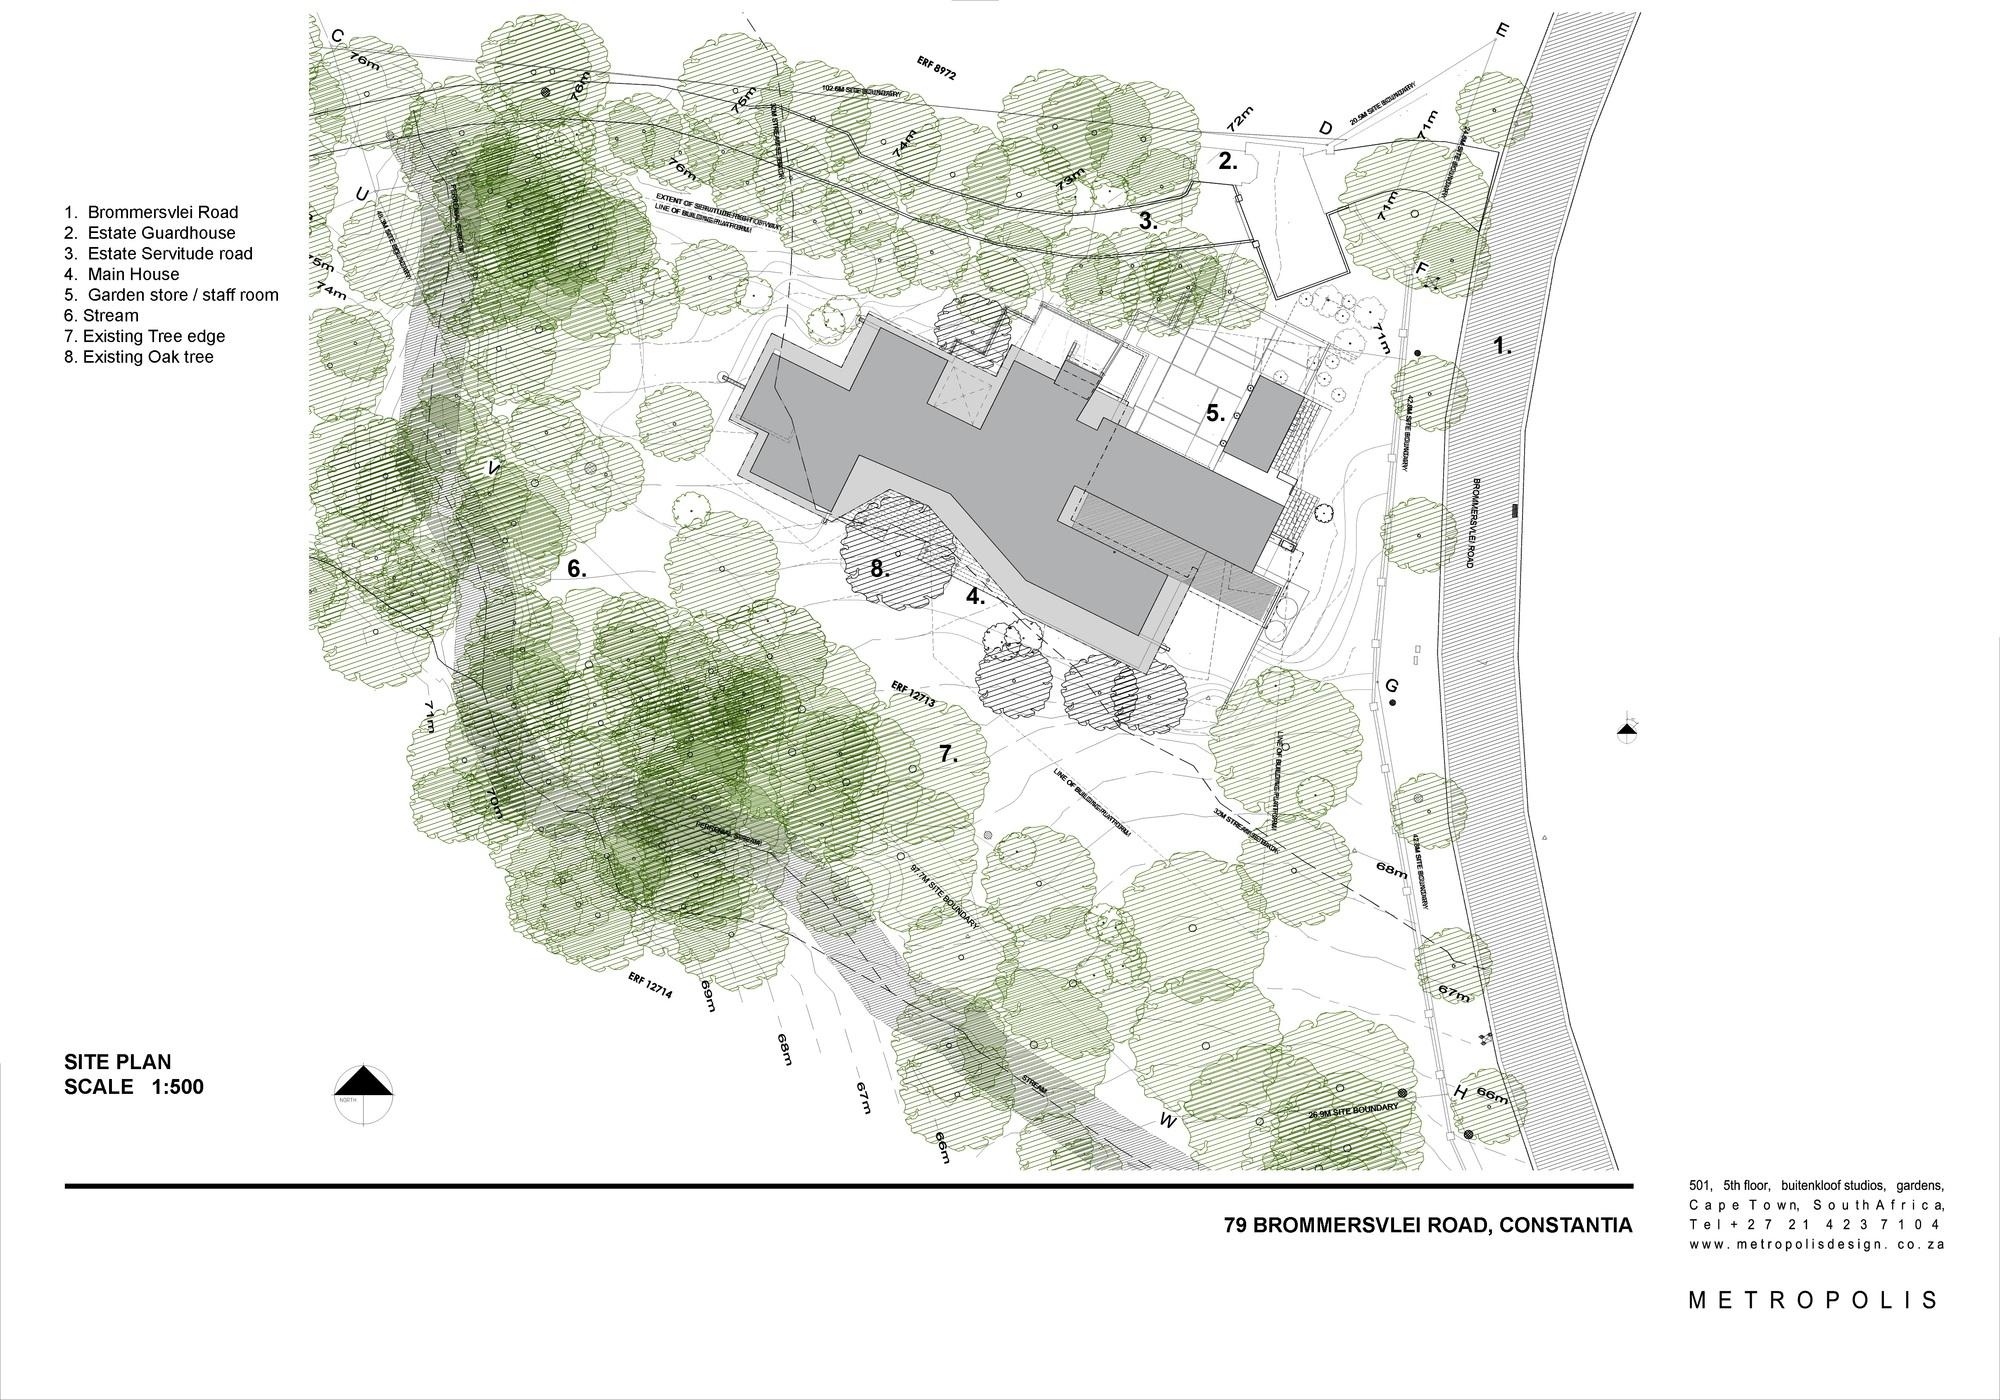 Gallery of House in Constantia Valley / Metropolis Design - 20